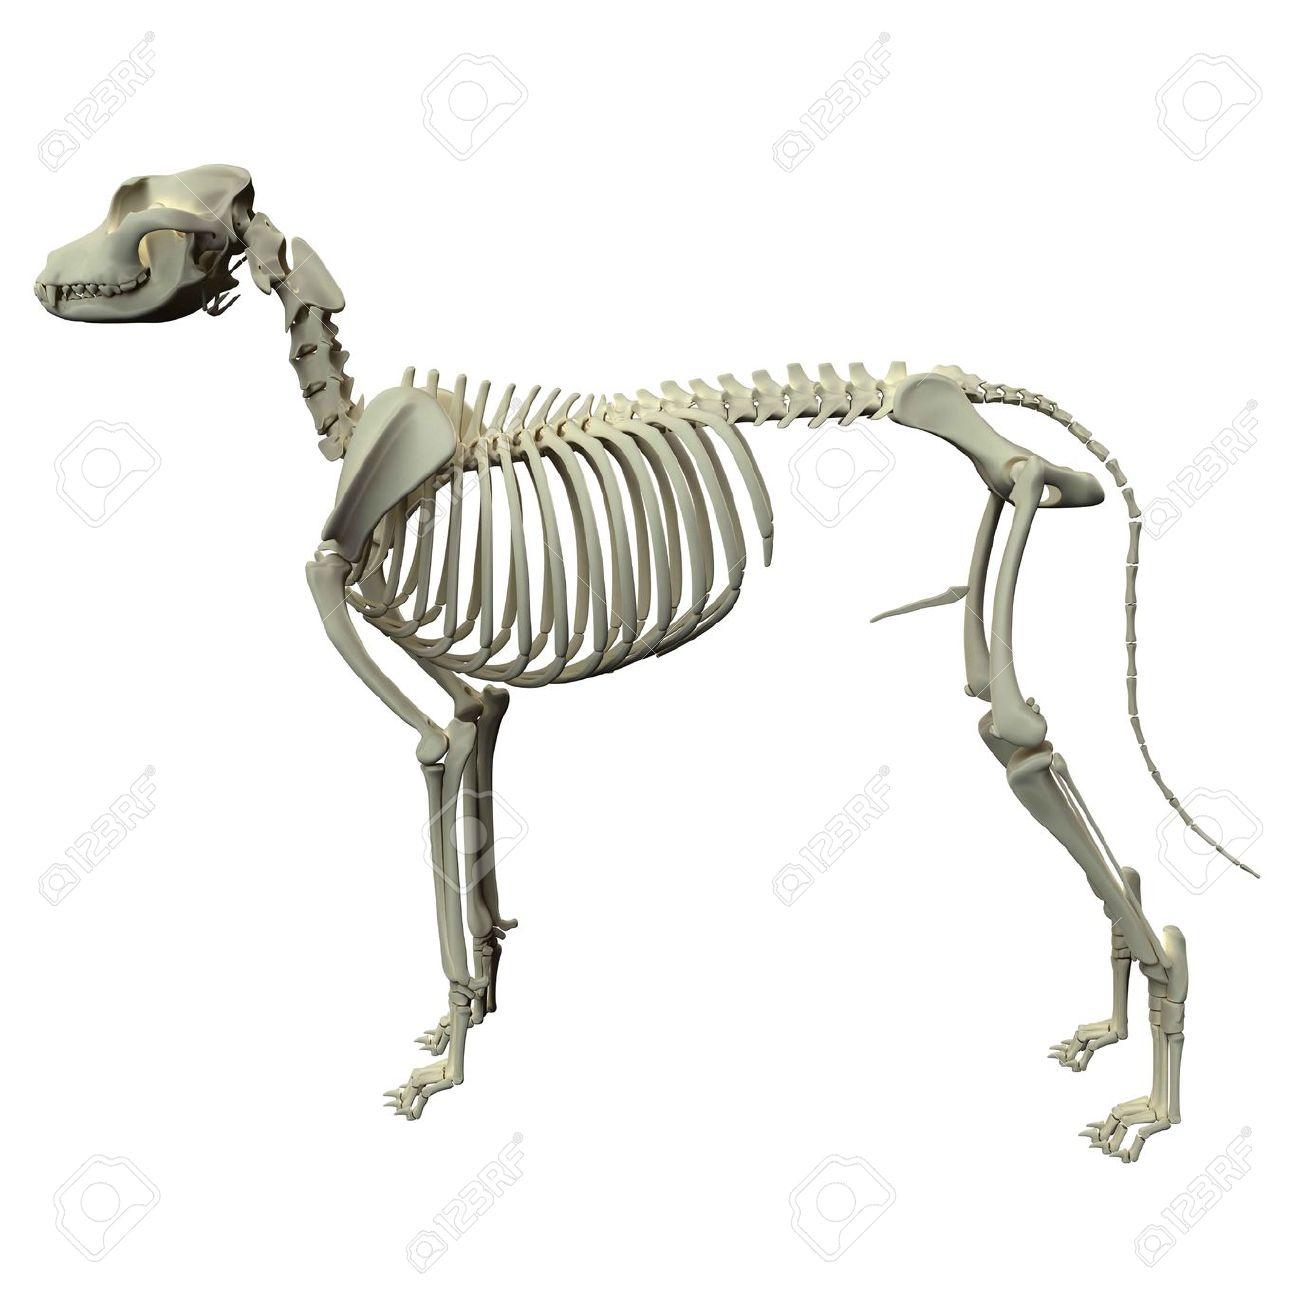 Perro Esqueleto Anatomía - Anatomía De Un Perro Esqueleto Masculino ...